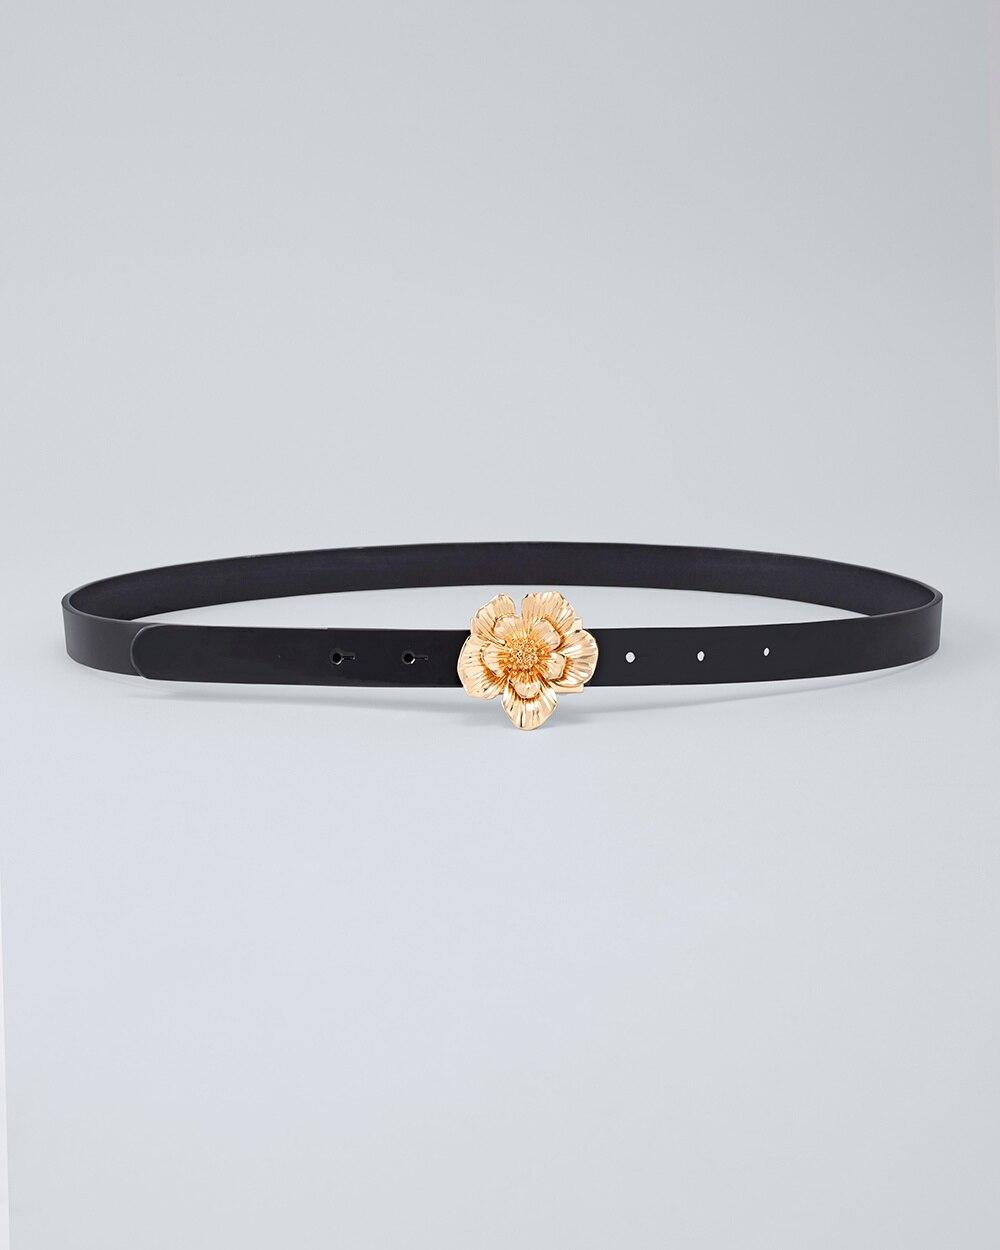 Flower Buckle Belt by Whbm